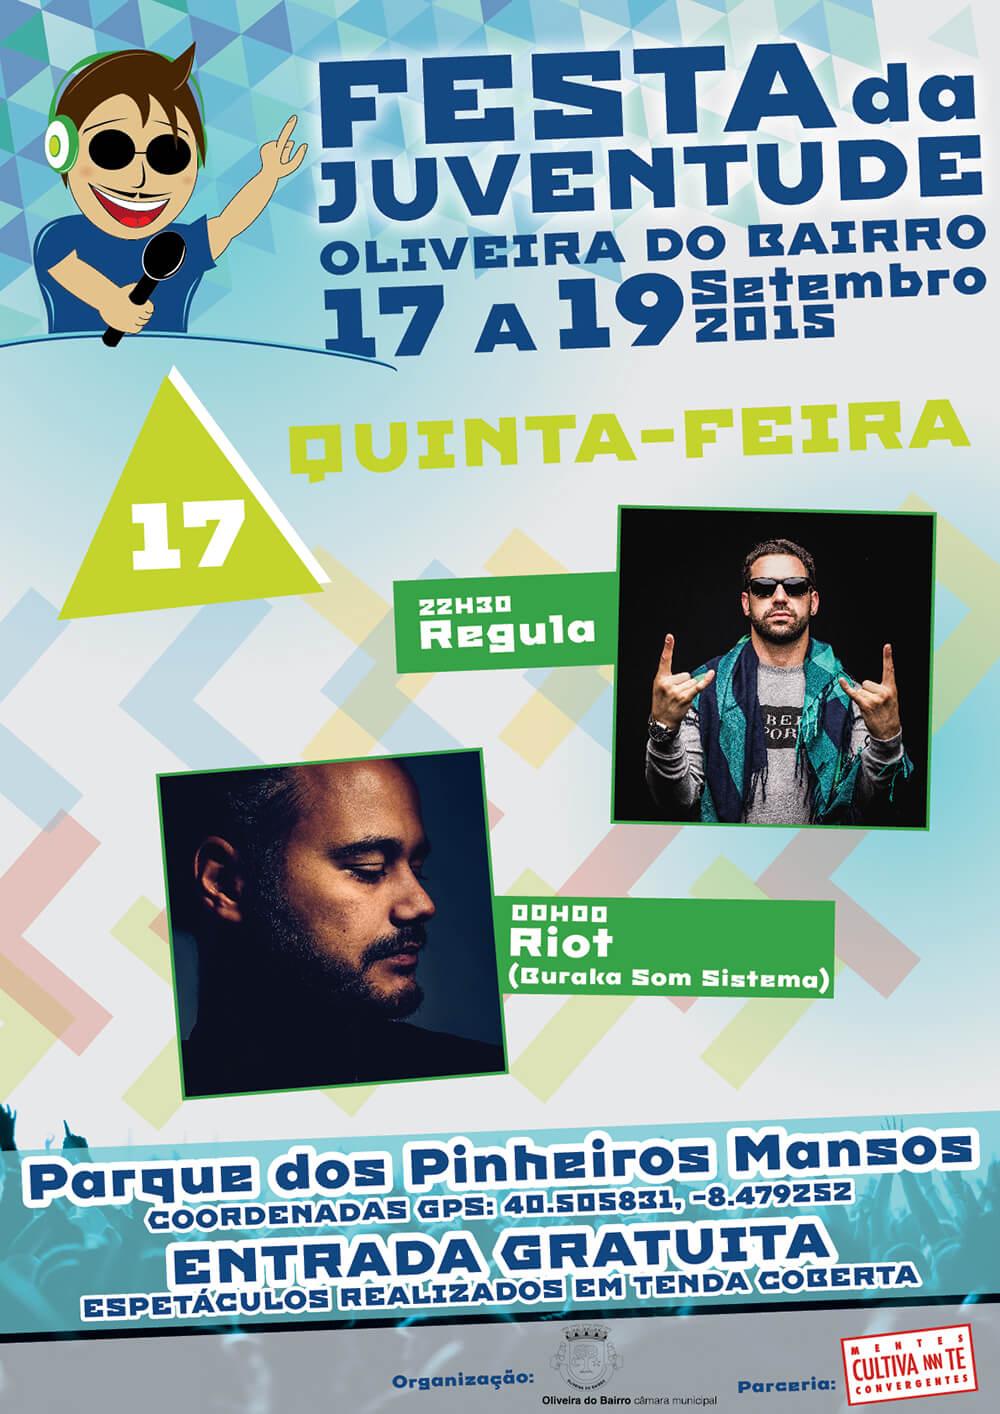 Festa da Juventude de Oliveira do Bairro - Poster for the 17th day | Way2Start - Design & Digital Agency